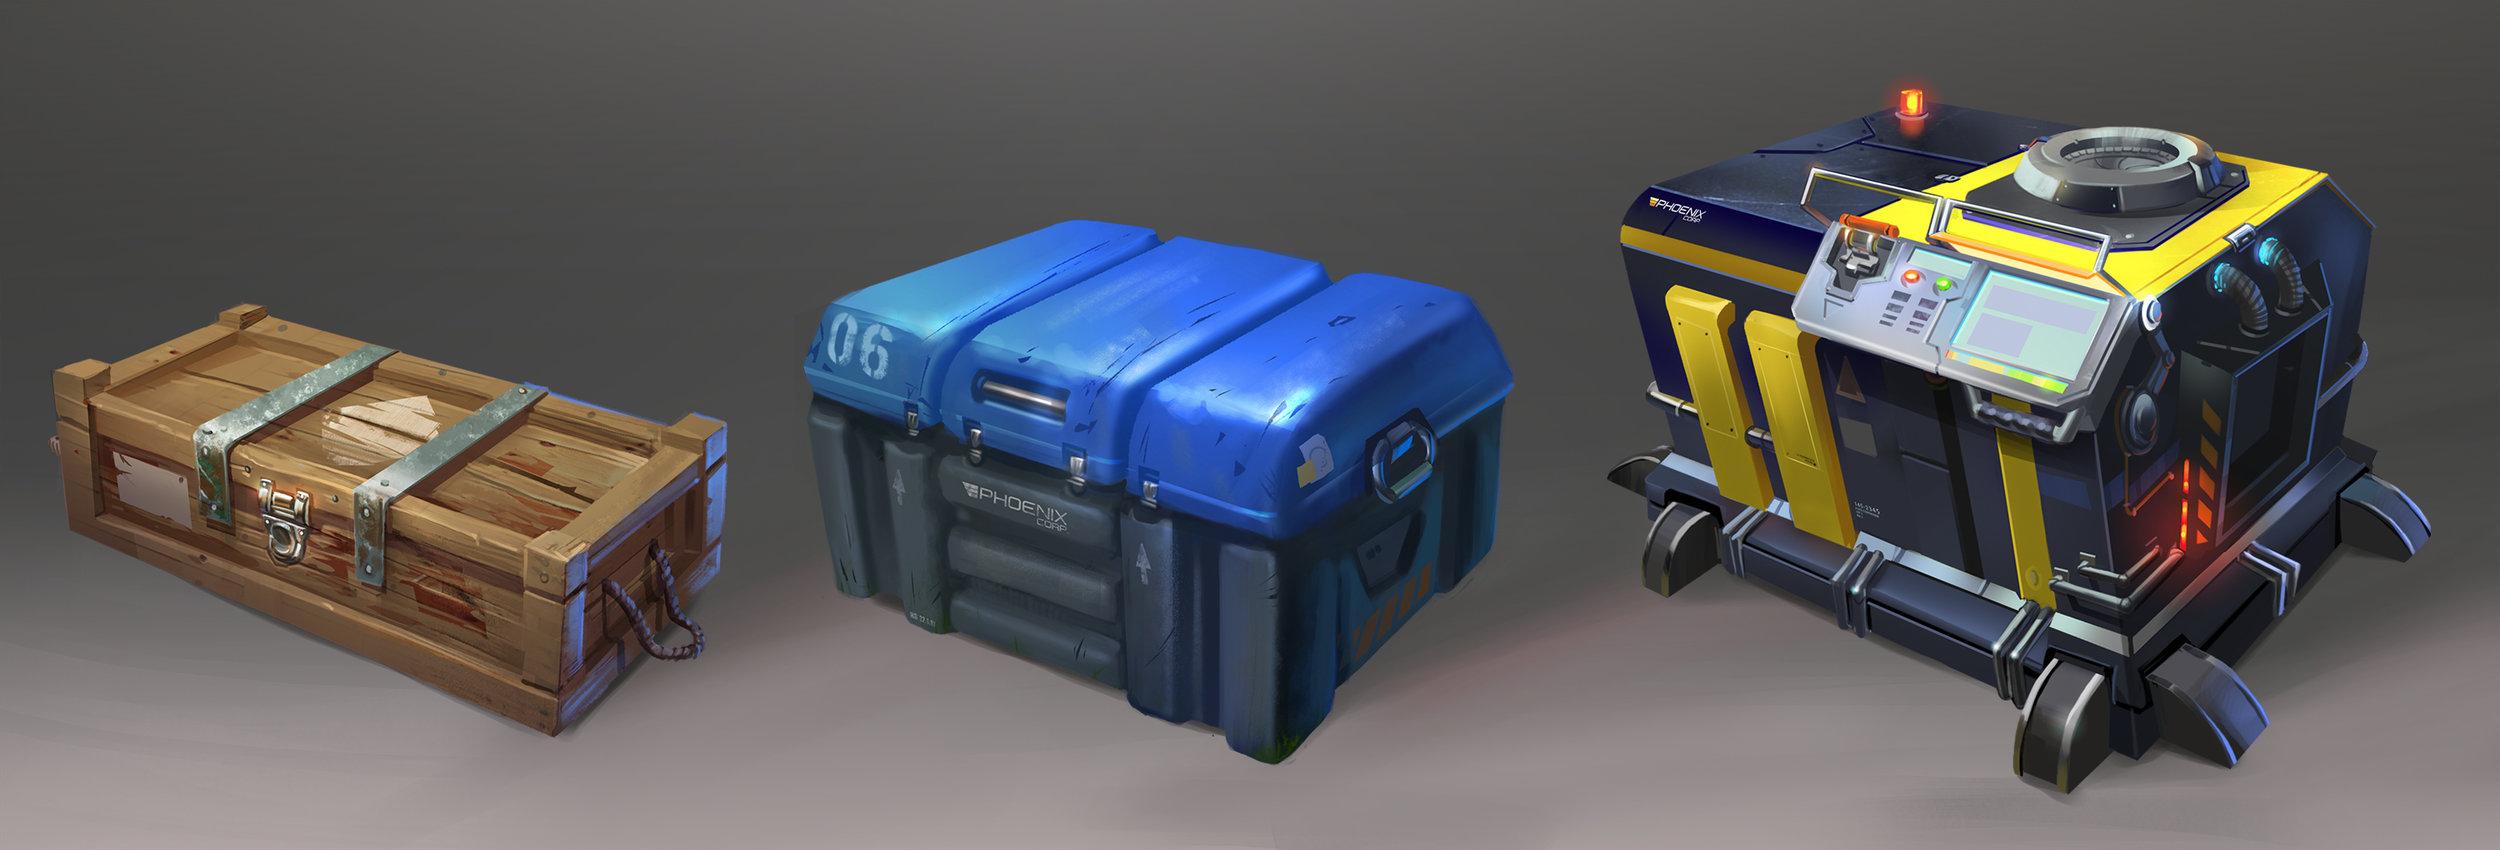 Drone+crates.jpg